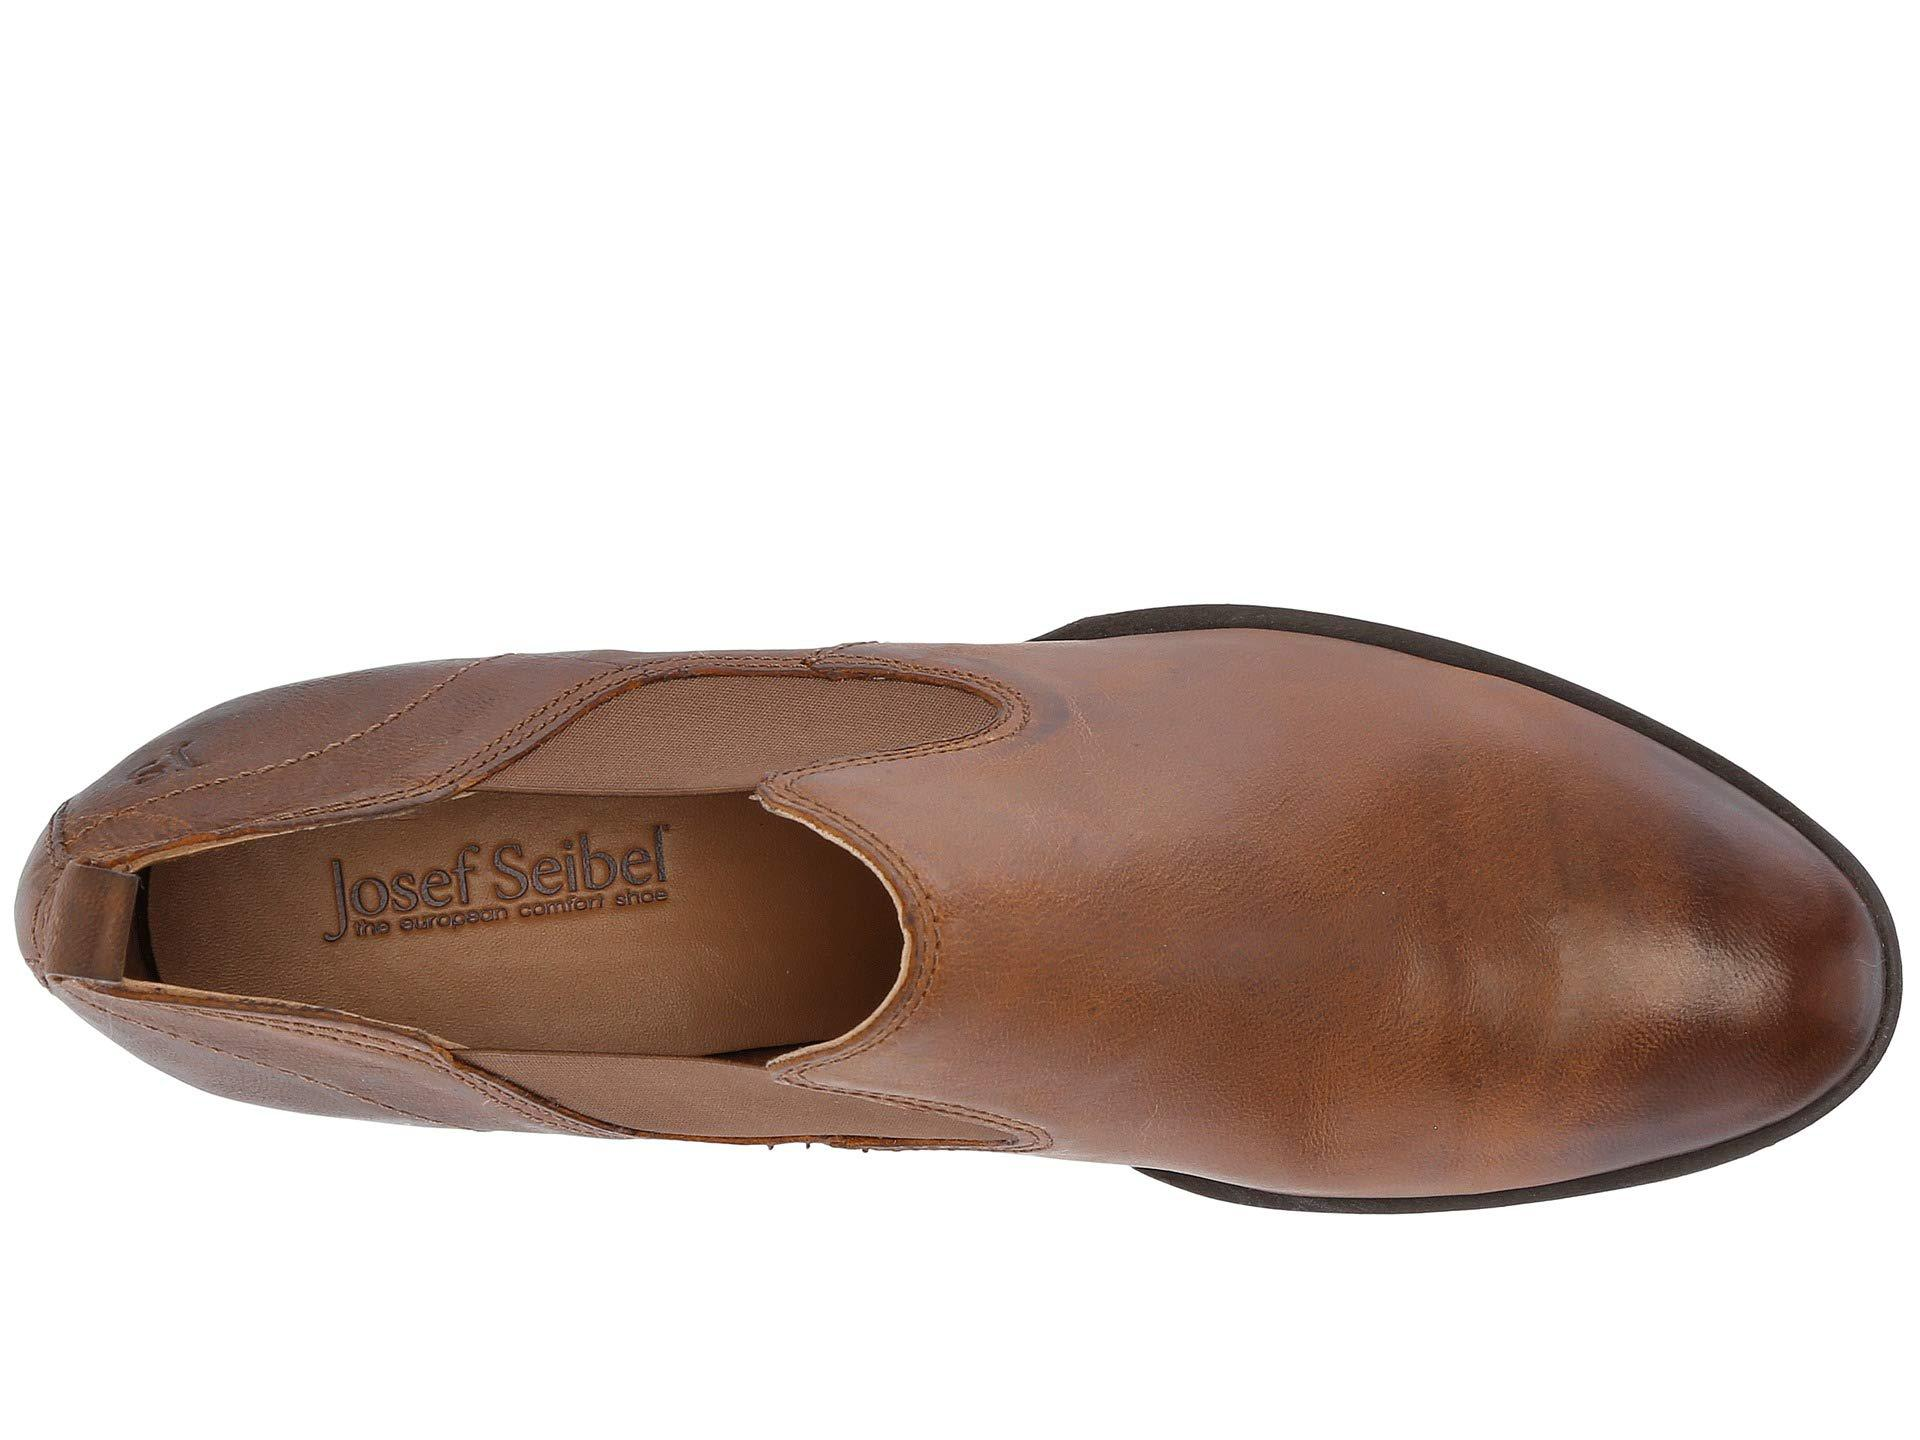 517433a22c6d Lyst - Josef Seibel Daphne 17 (moro) Women s Shoes in Brown